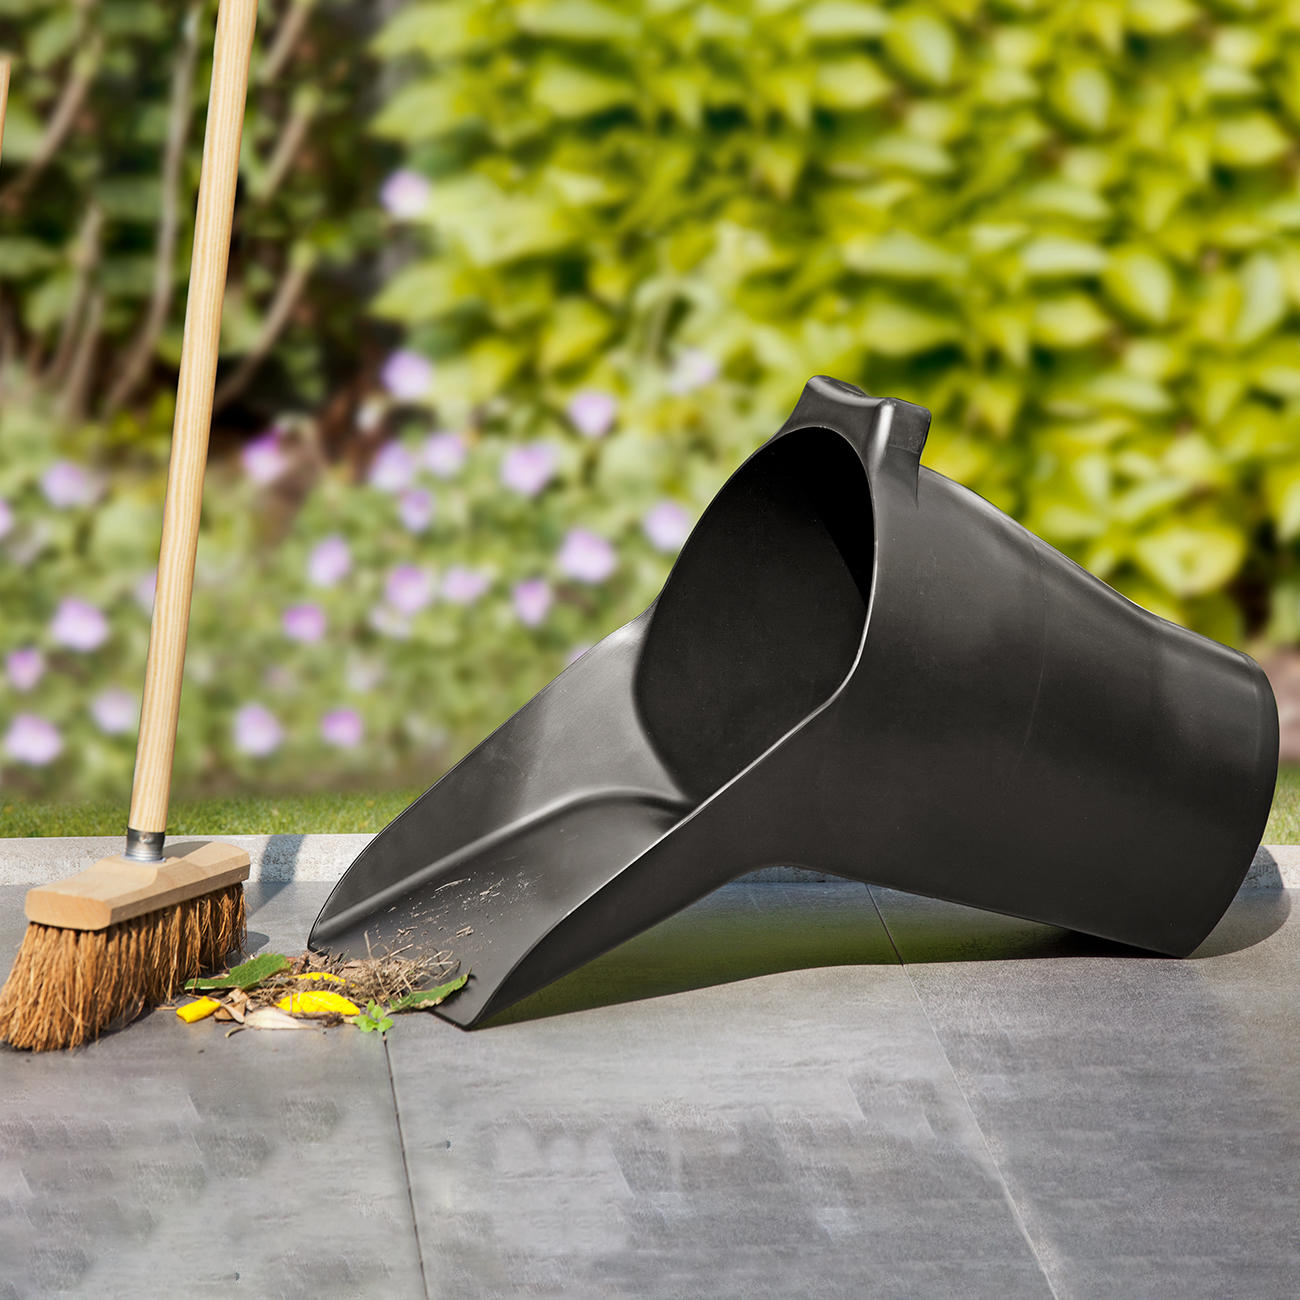 swepper 3 jahre garantie pro idee. Black Bedroom Furniture Sets. Home Design Ideas